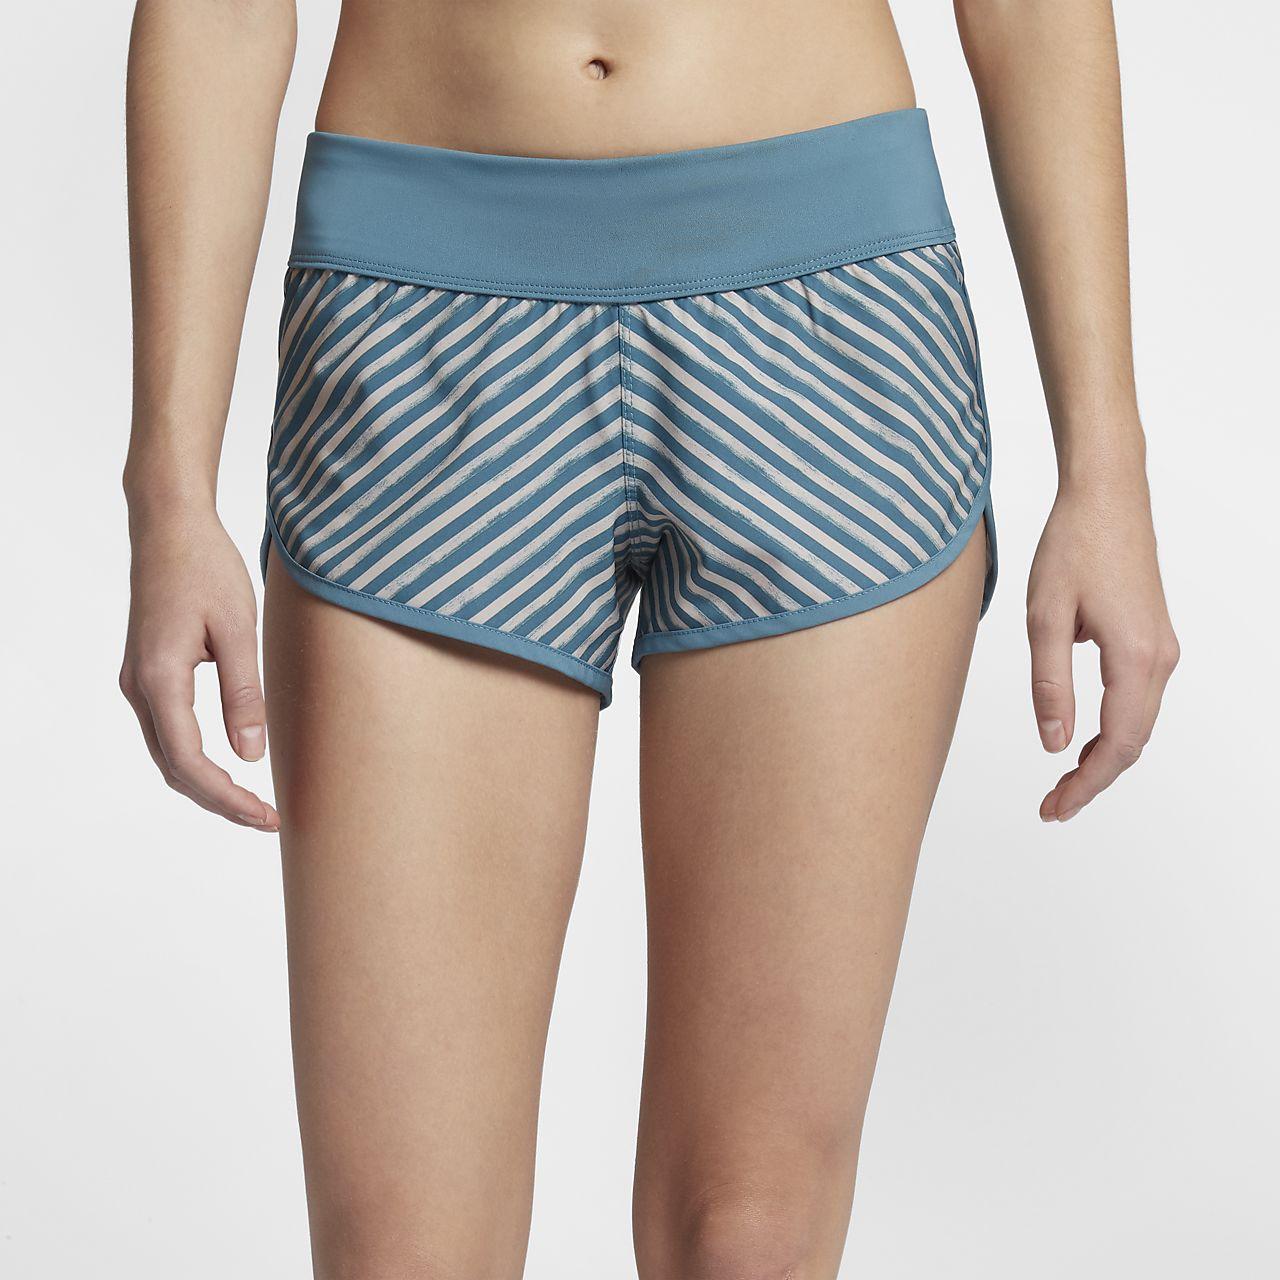 Nike Womens Boardshorts - Nike Hurley Phantom Printed Beachrider A47l5406